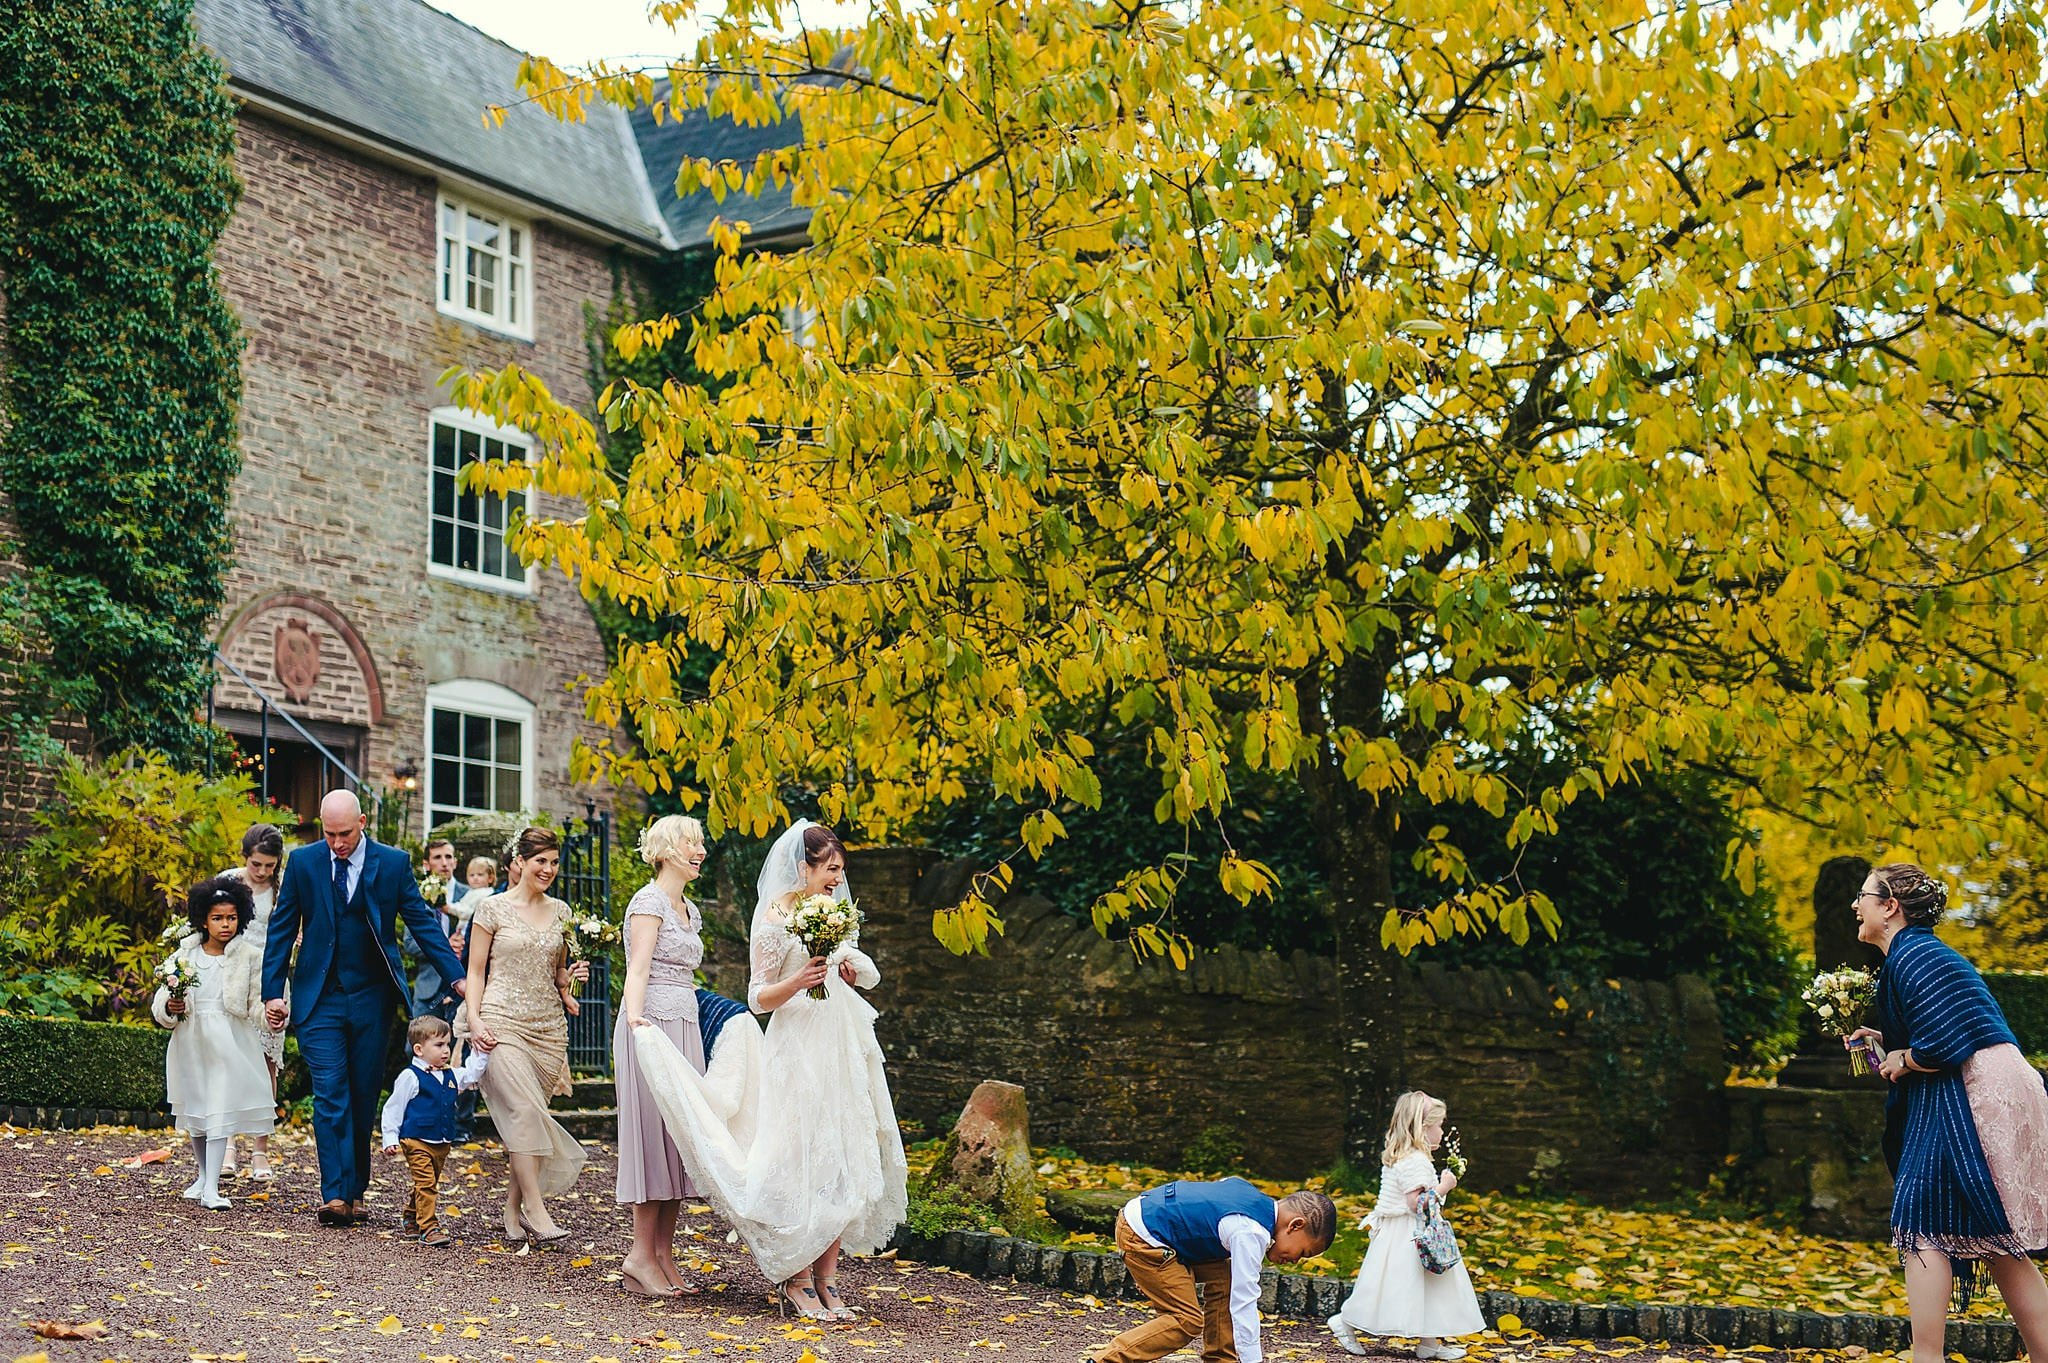 Dewsall Court wedding photography Herefordshire | Laura + Alex 43